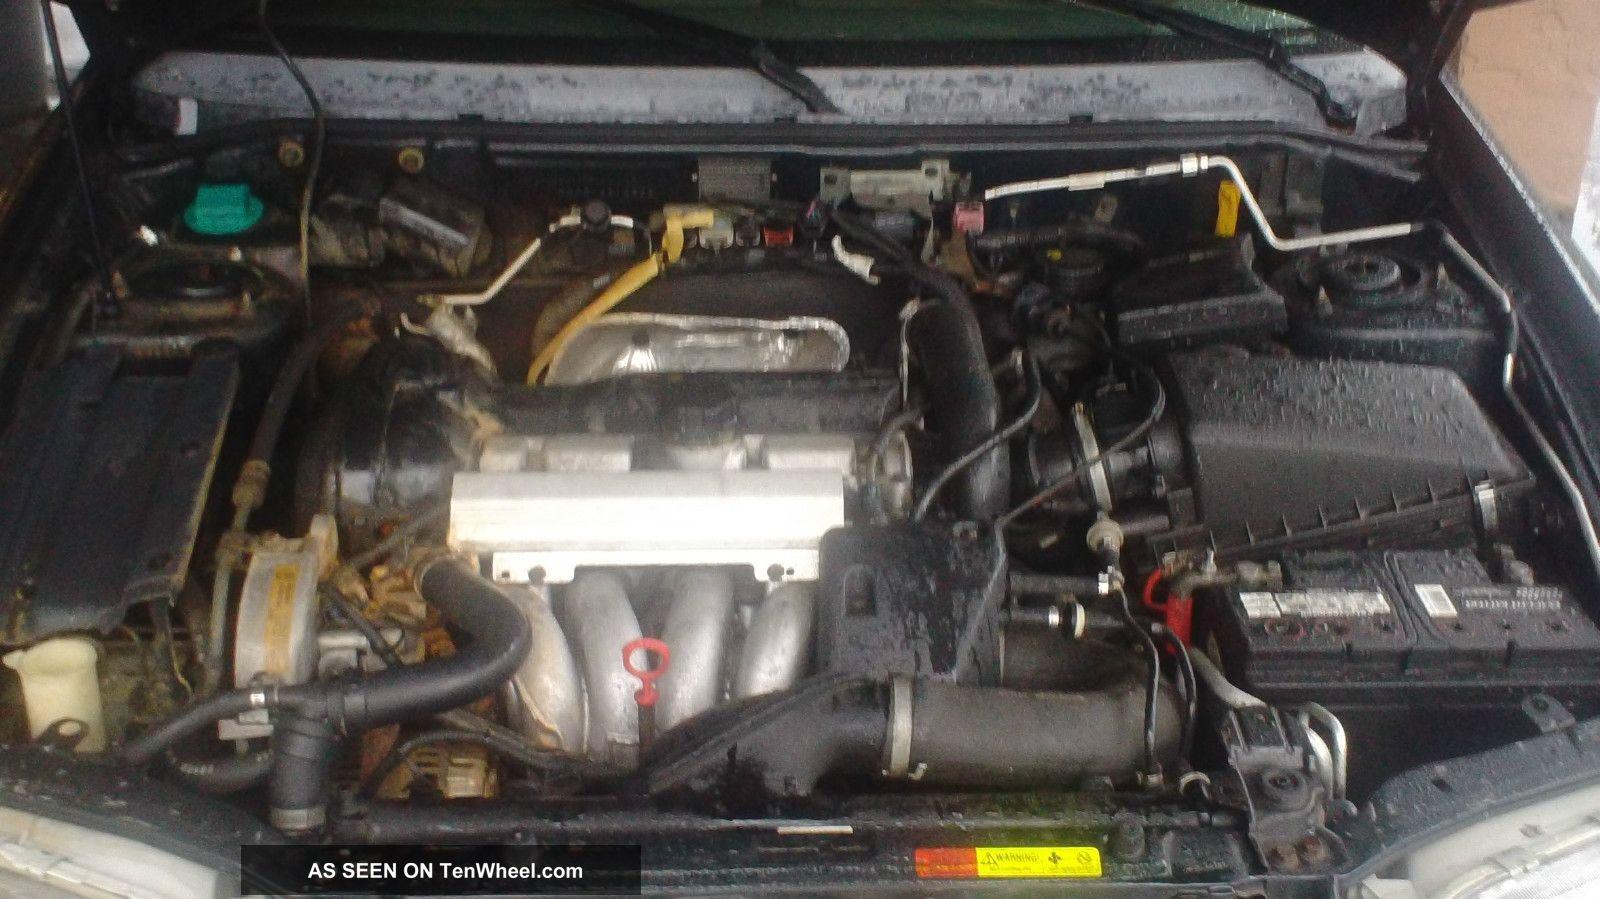 Volvo V Base Wagon Door L Turbocharged Lgw on 2000 Hyundai Elantra Black Seats